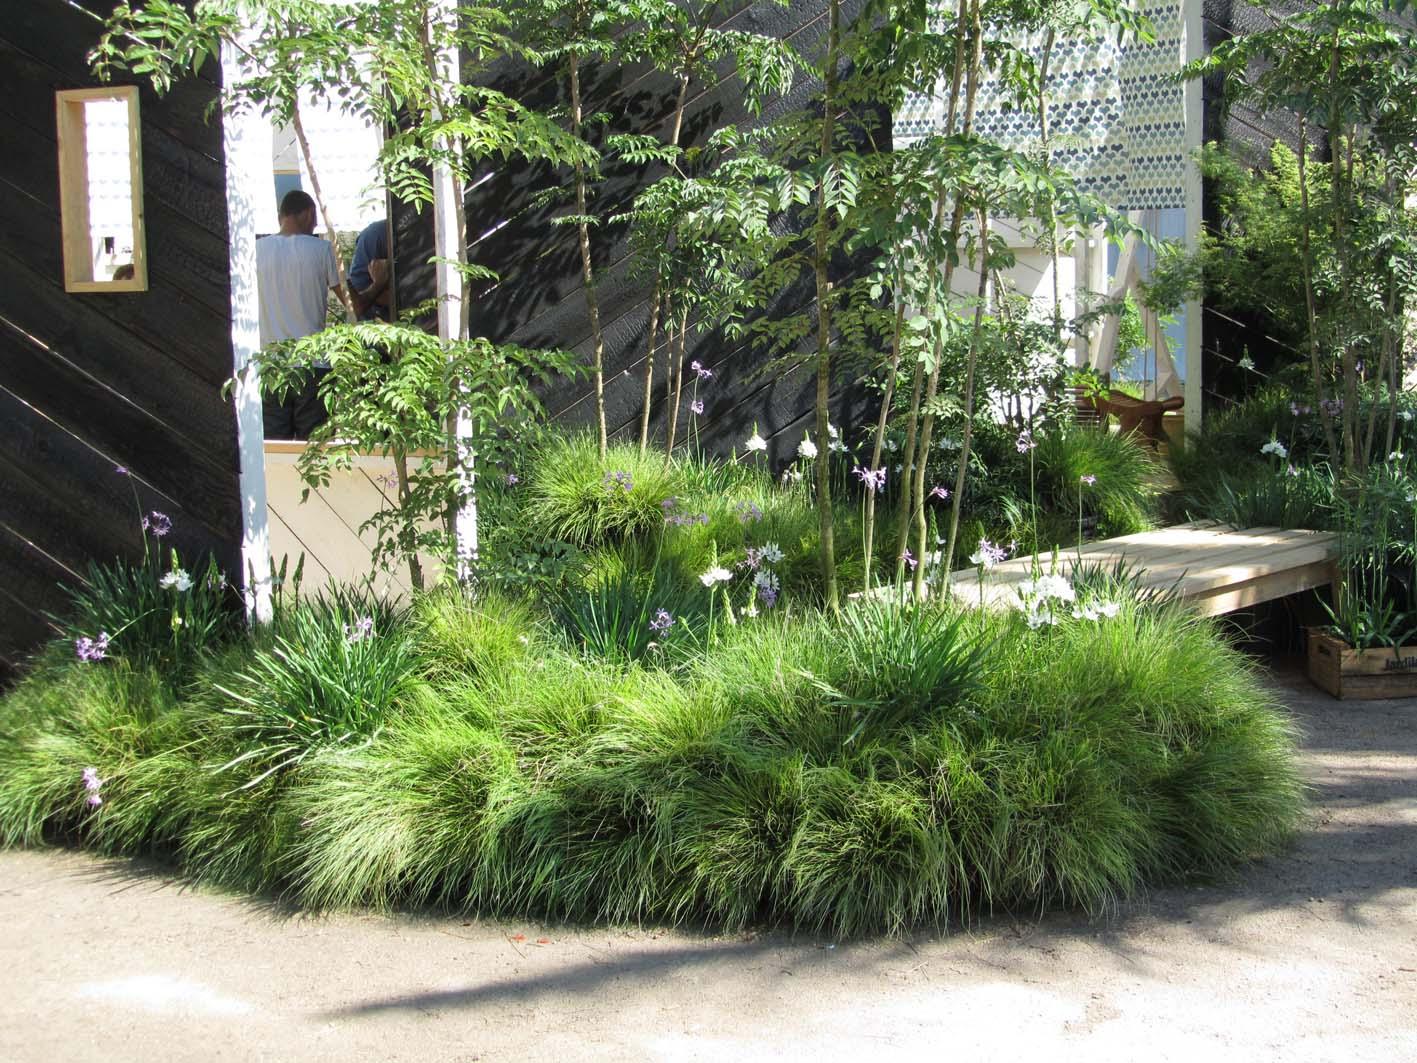 Jardins jardin aux tuileries vysages for Jardins jardin aux tuileries